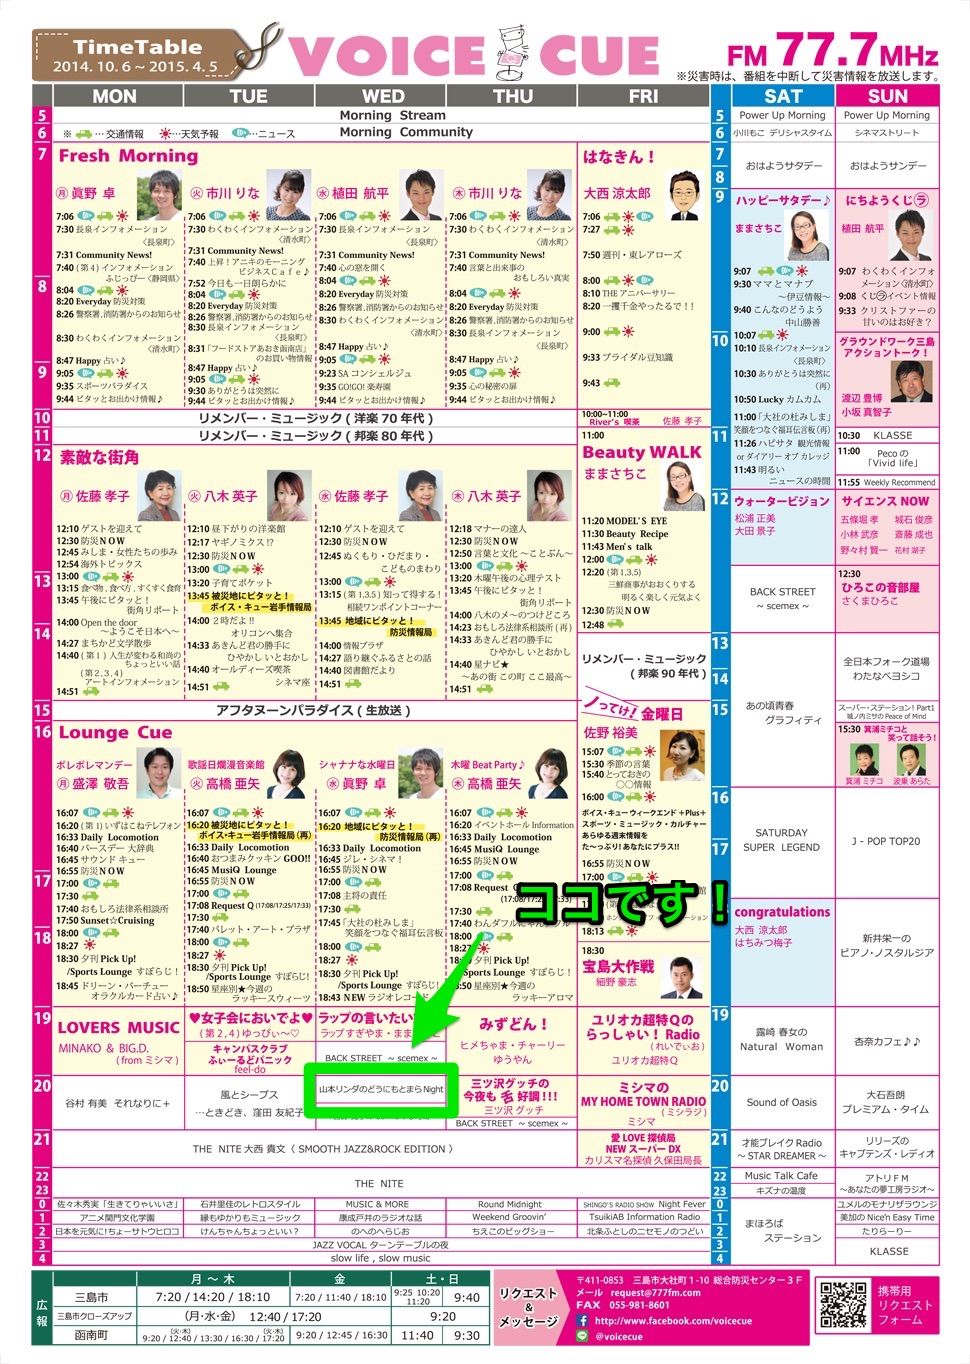 timetable2014_秋冬(OL)